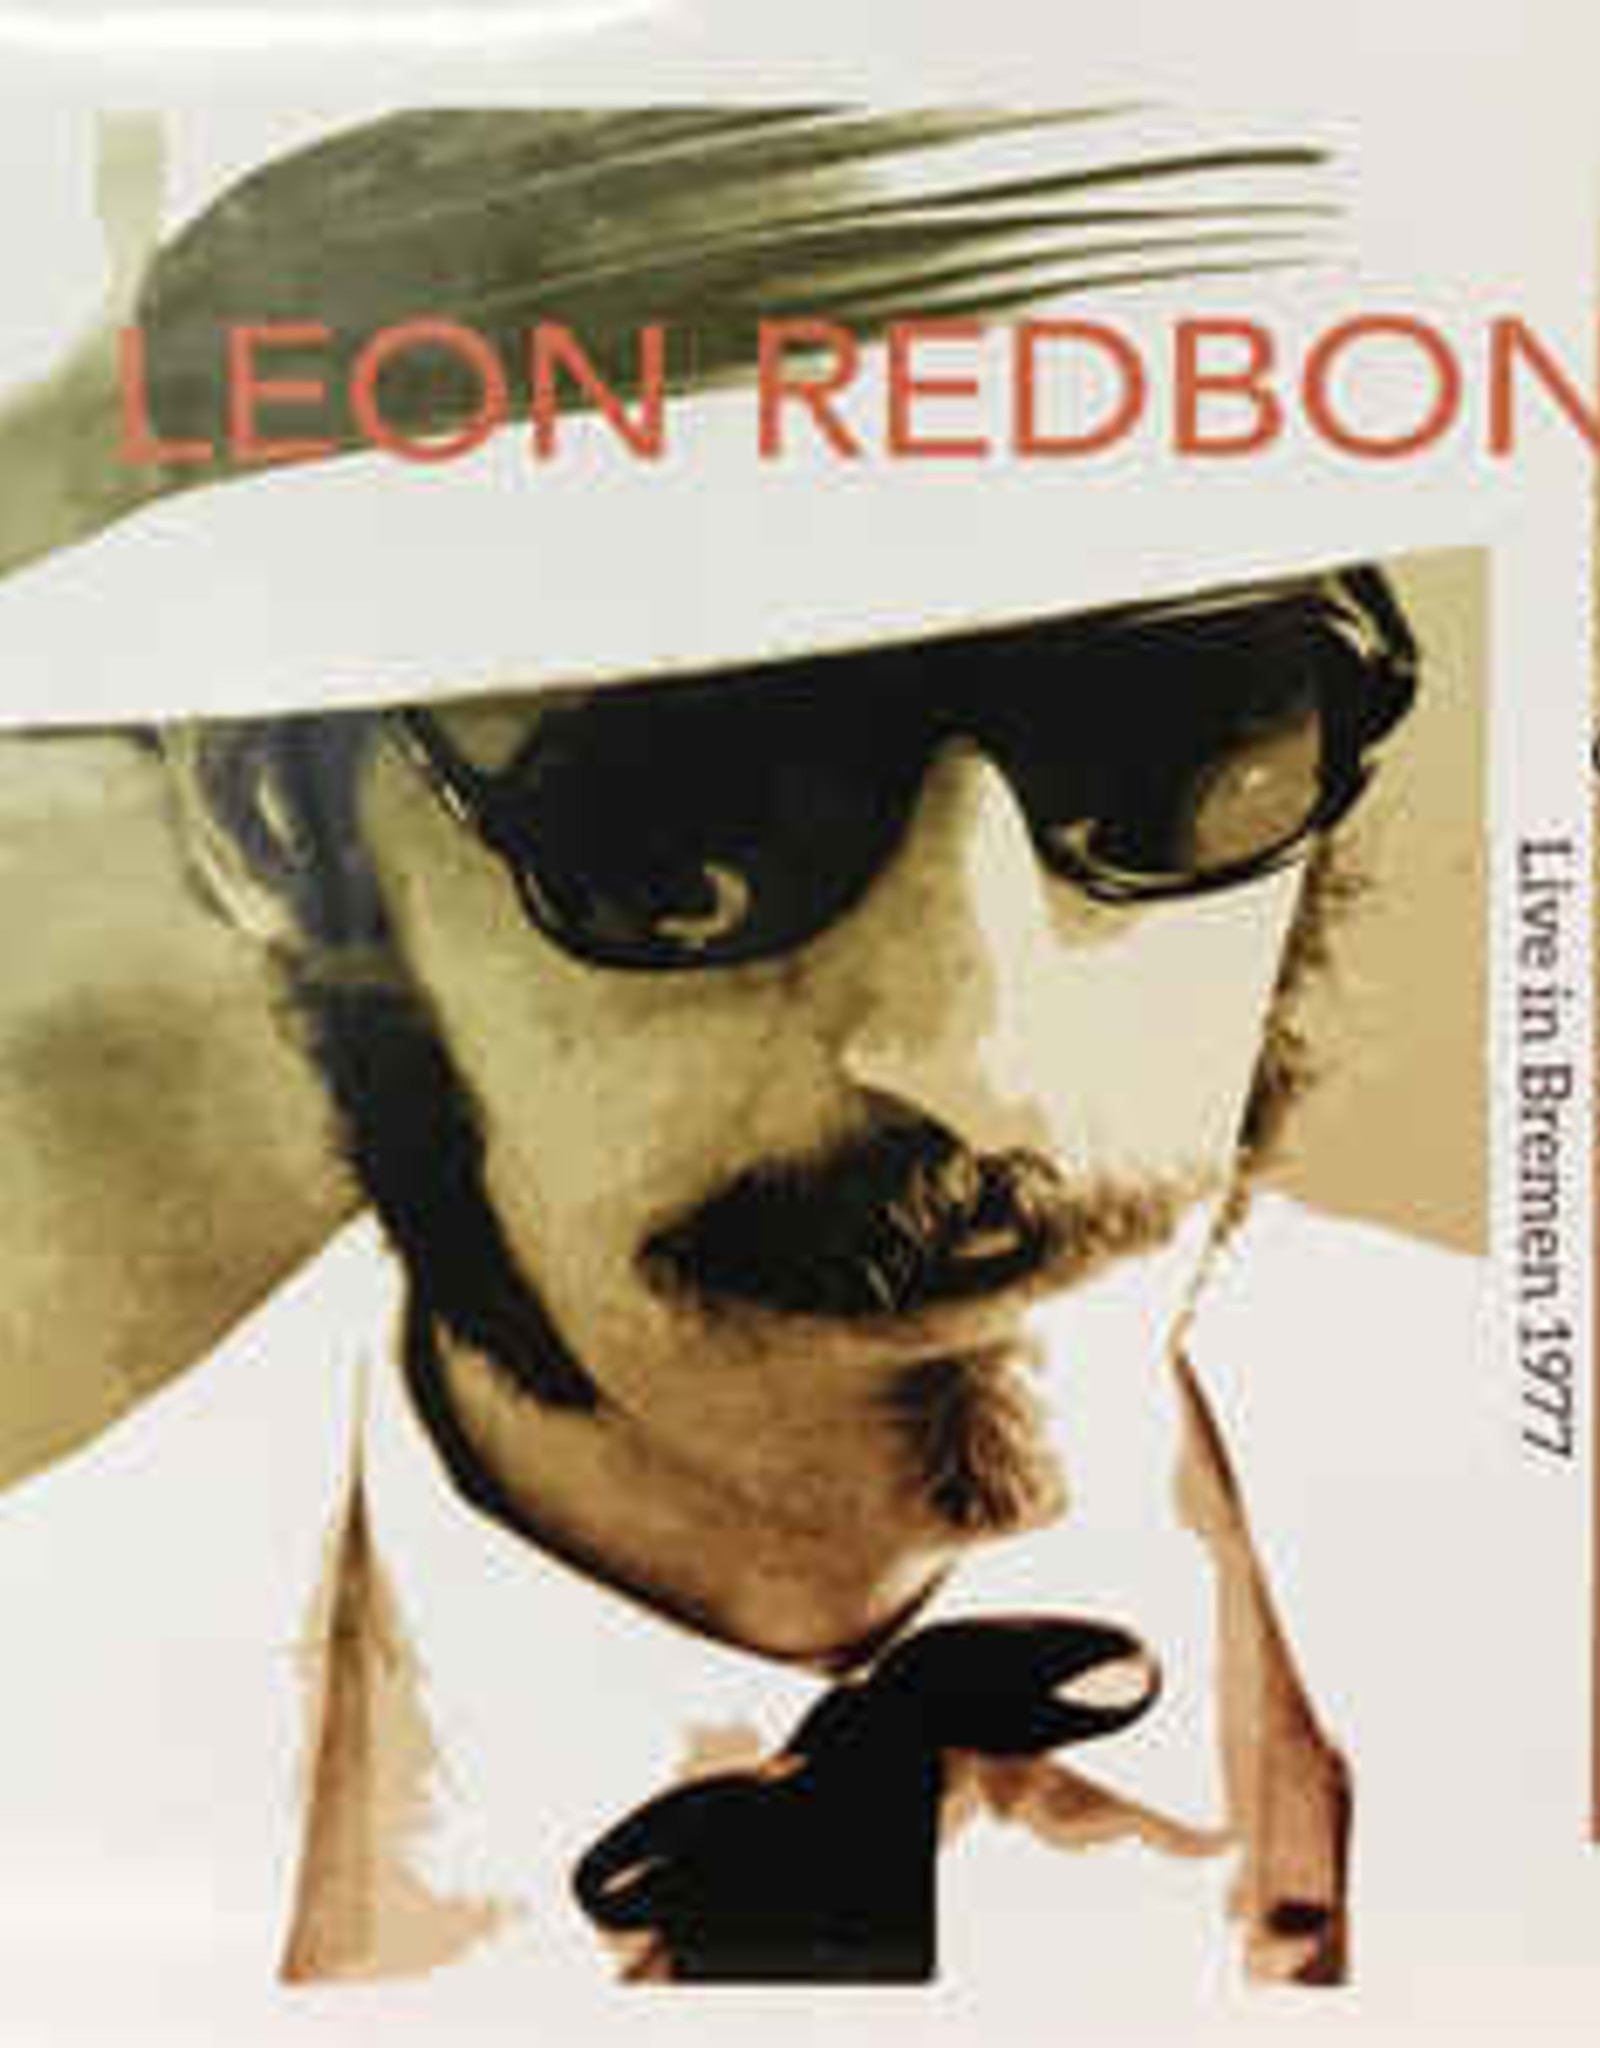 Leon Redbone - Strings & Jokes, Live In Bremen 1977 (Red Splatter Vinyl) (Rsd 2019)